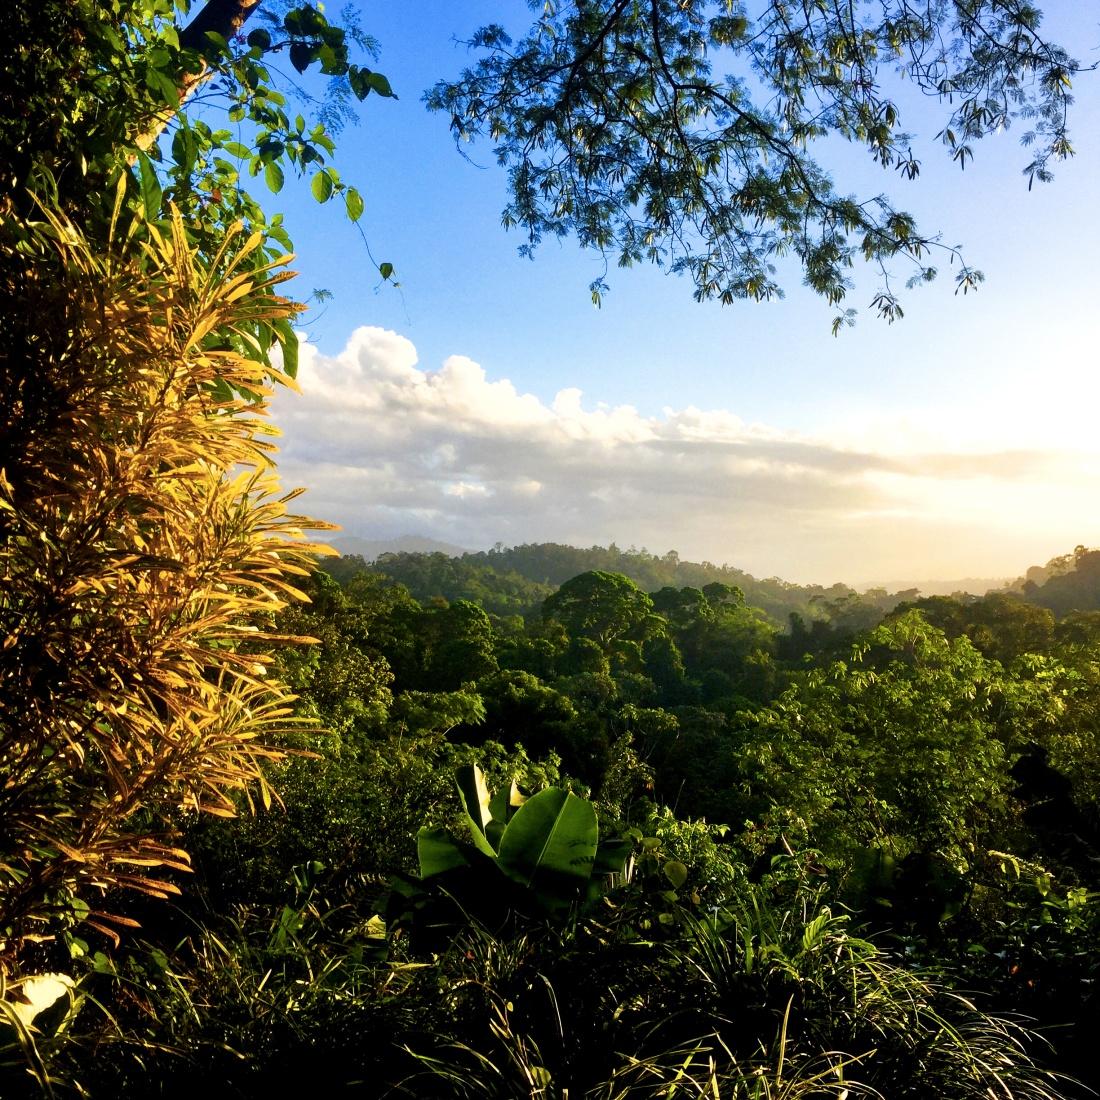 mirador-jungle-golden